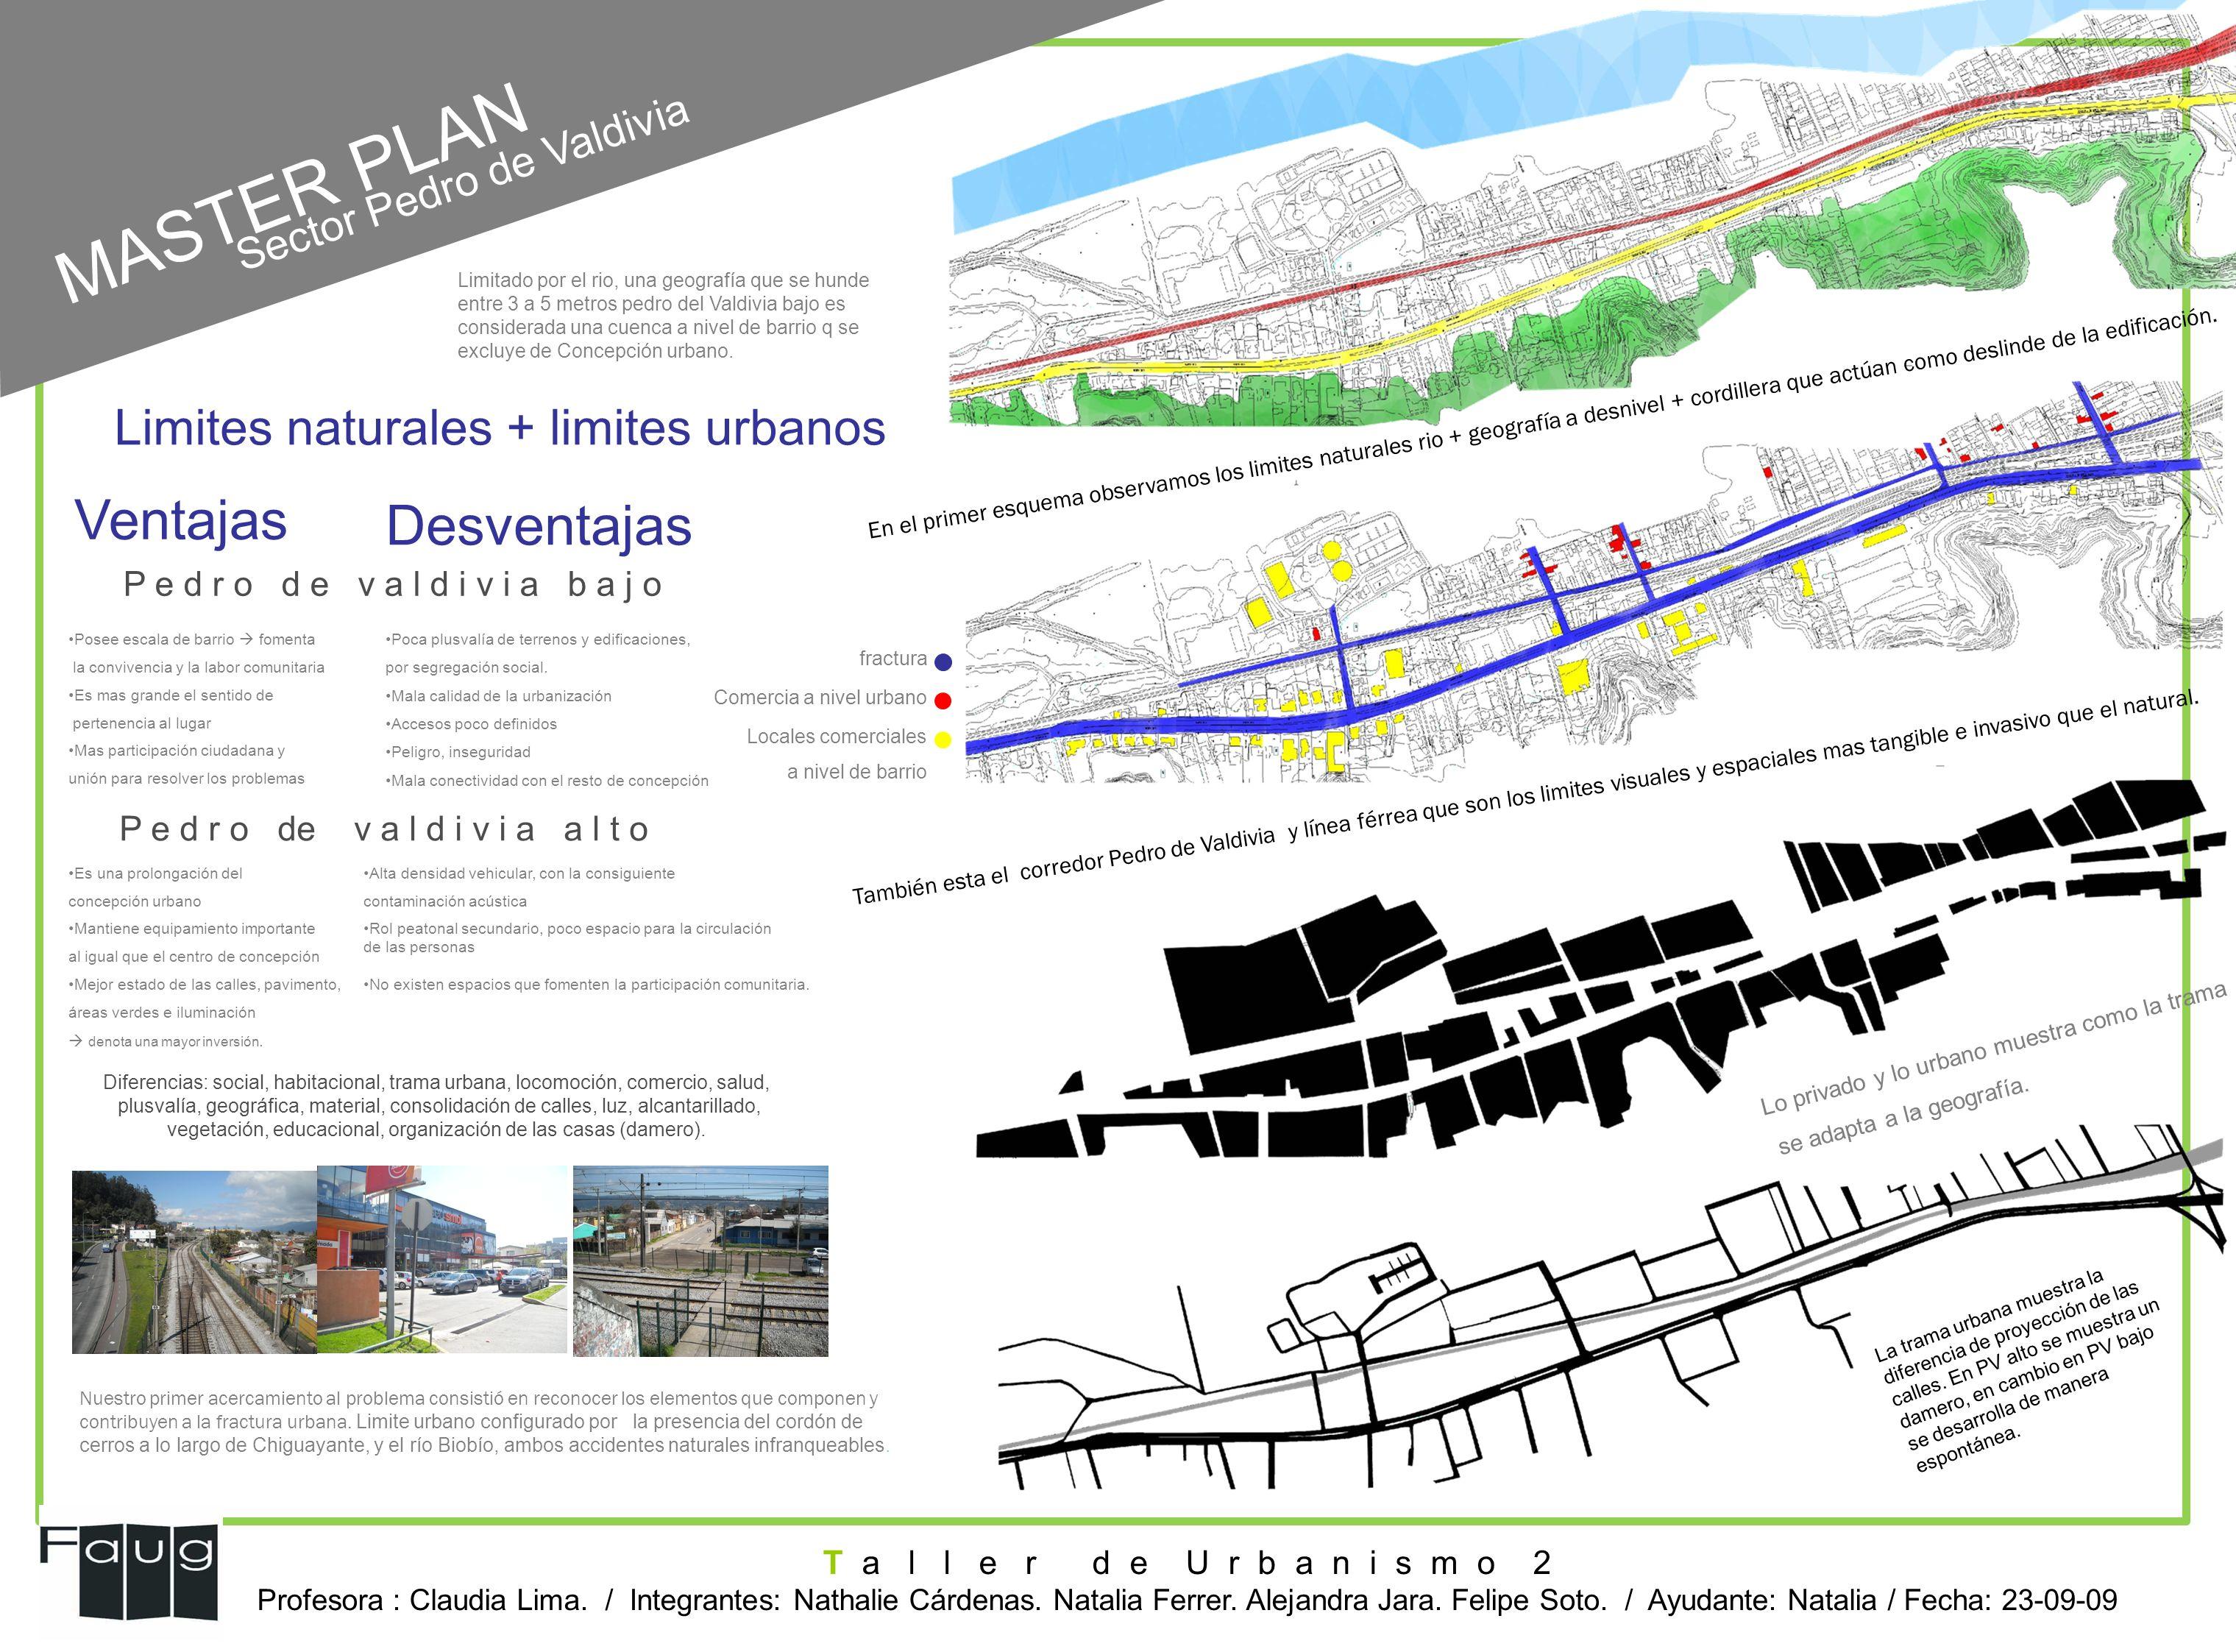 MASTER PLAN Limites naturales + limites urbanos Ventajas Desventajas